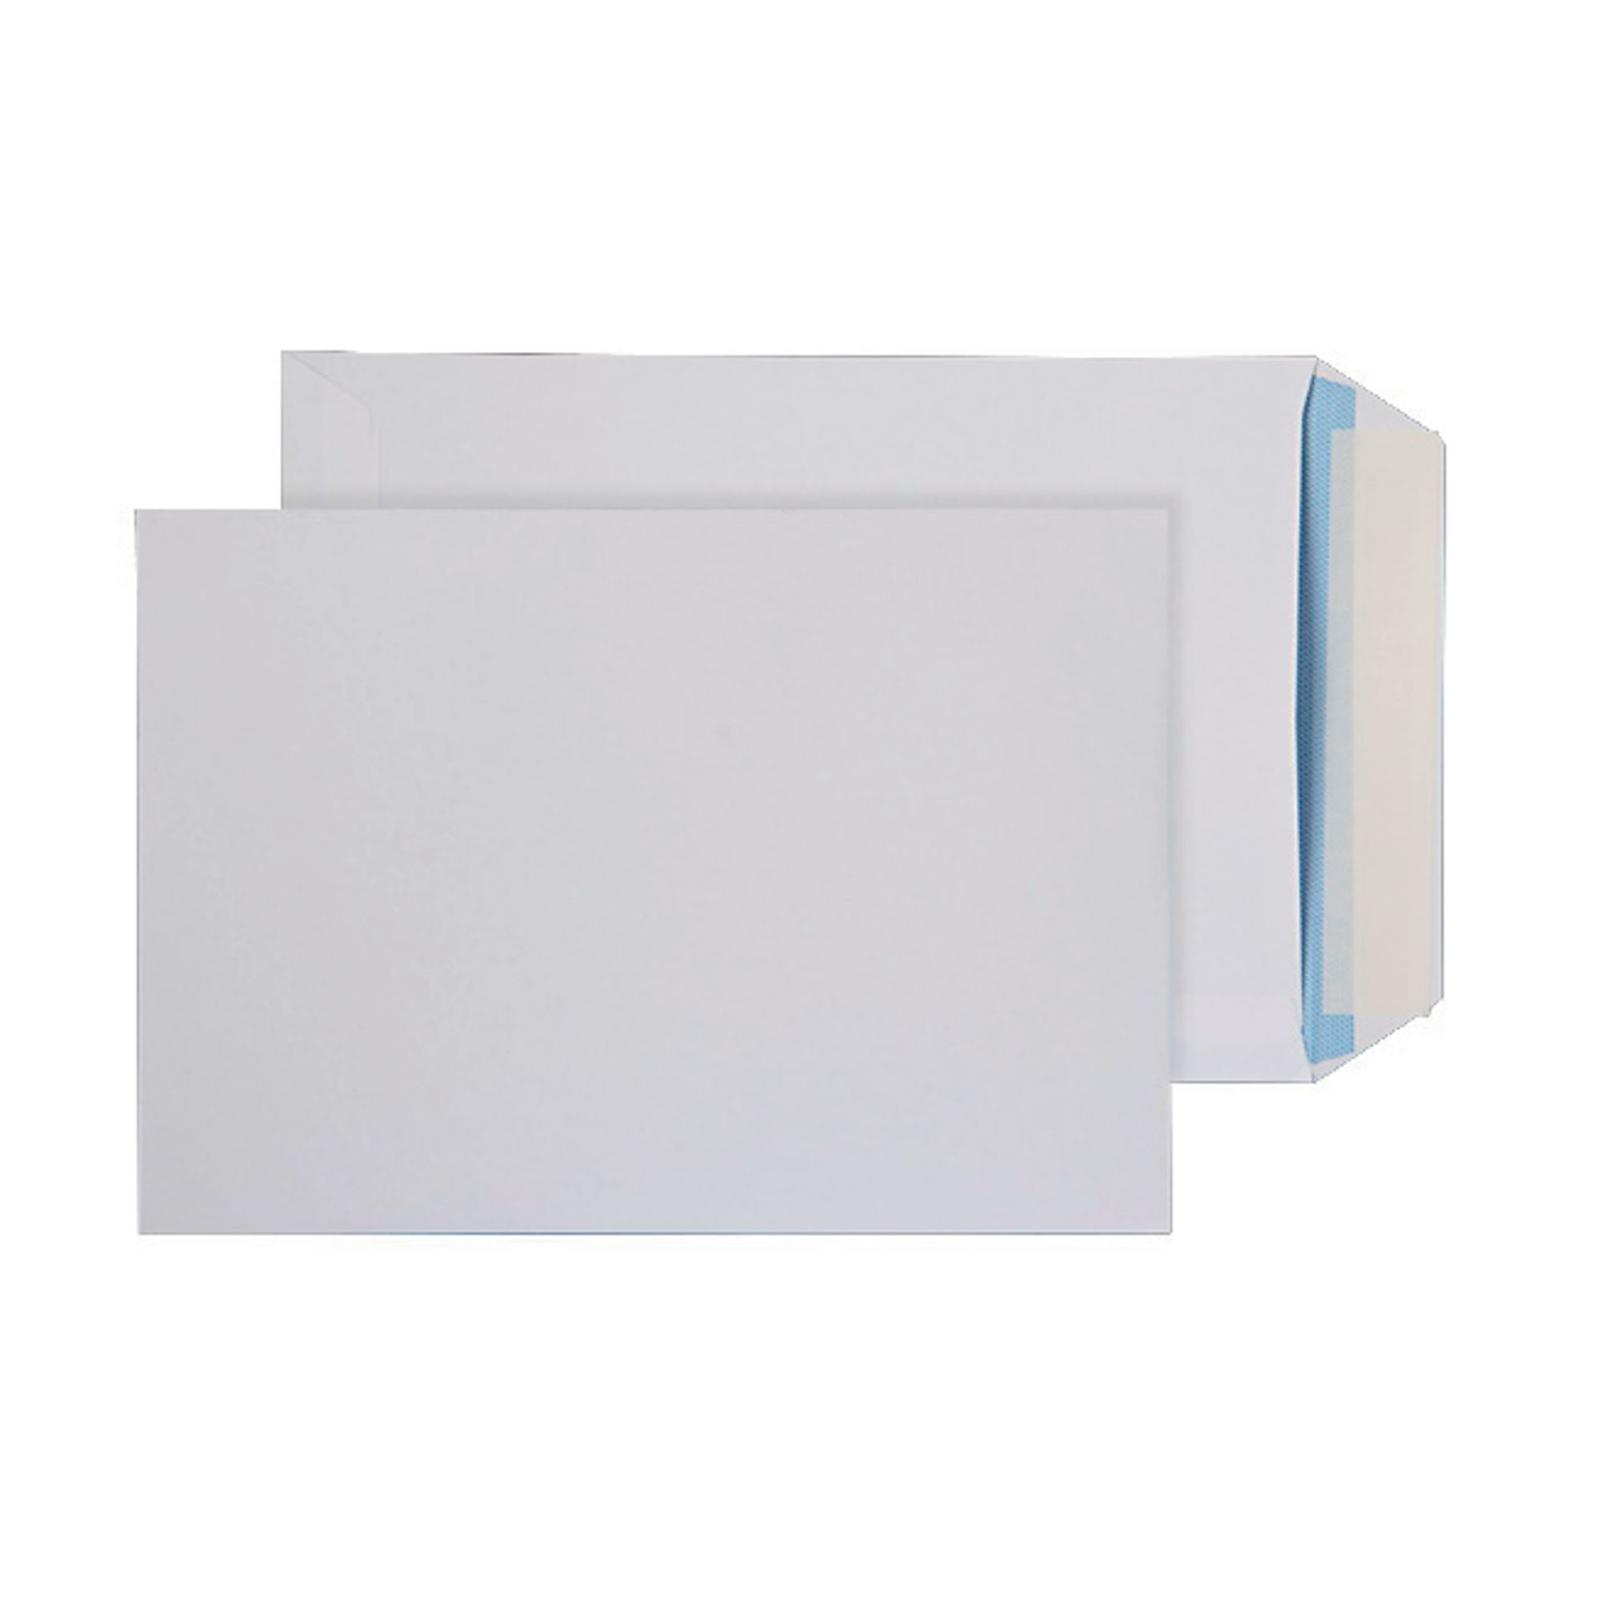 C5 White Peel and Seal Pocket Envelopes - Box of 500